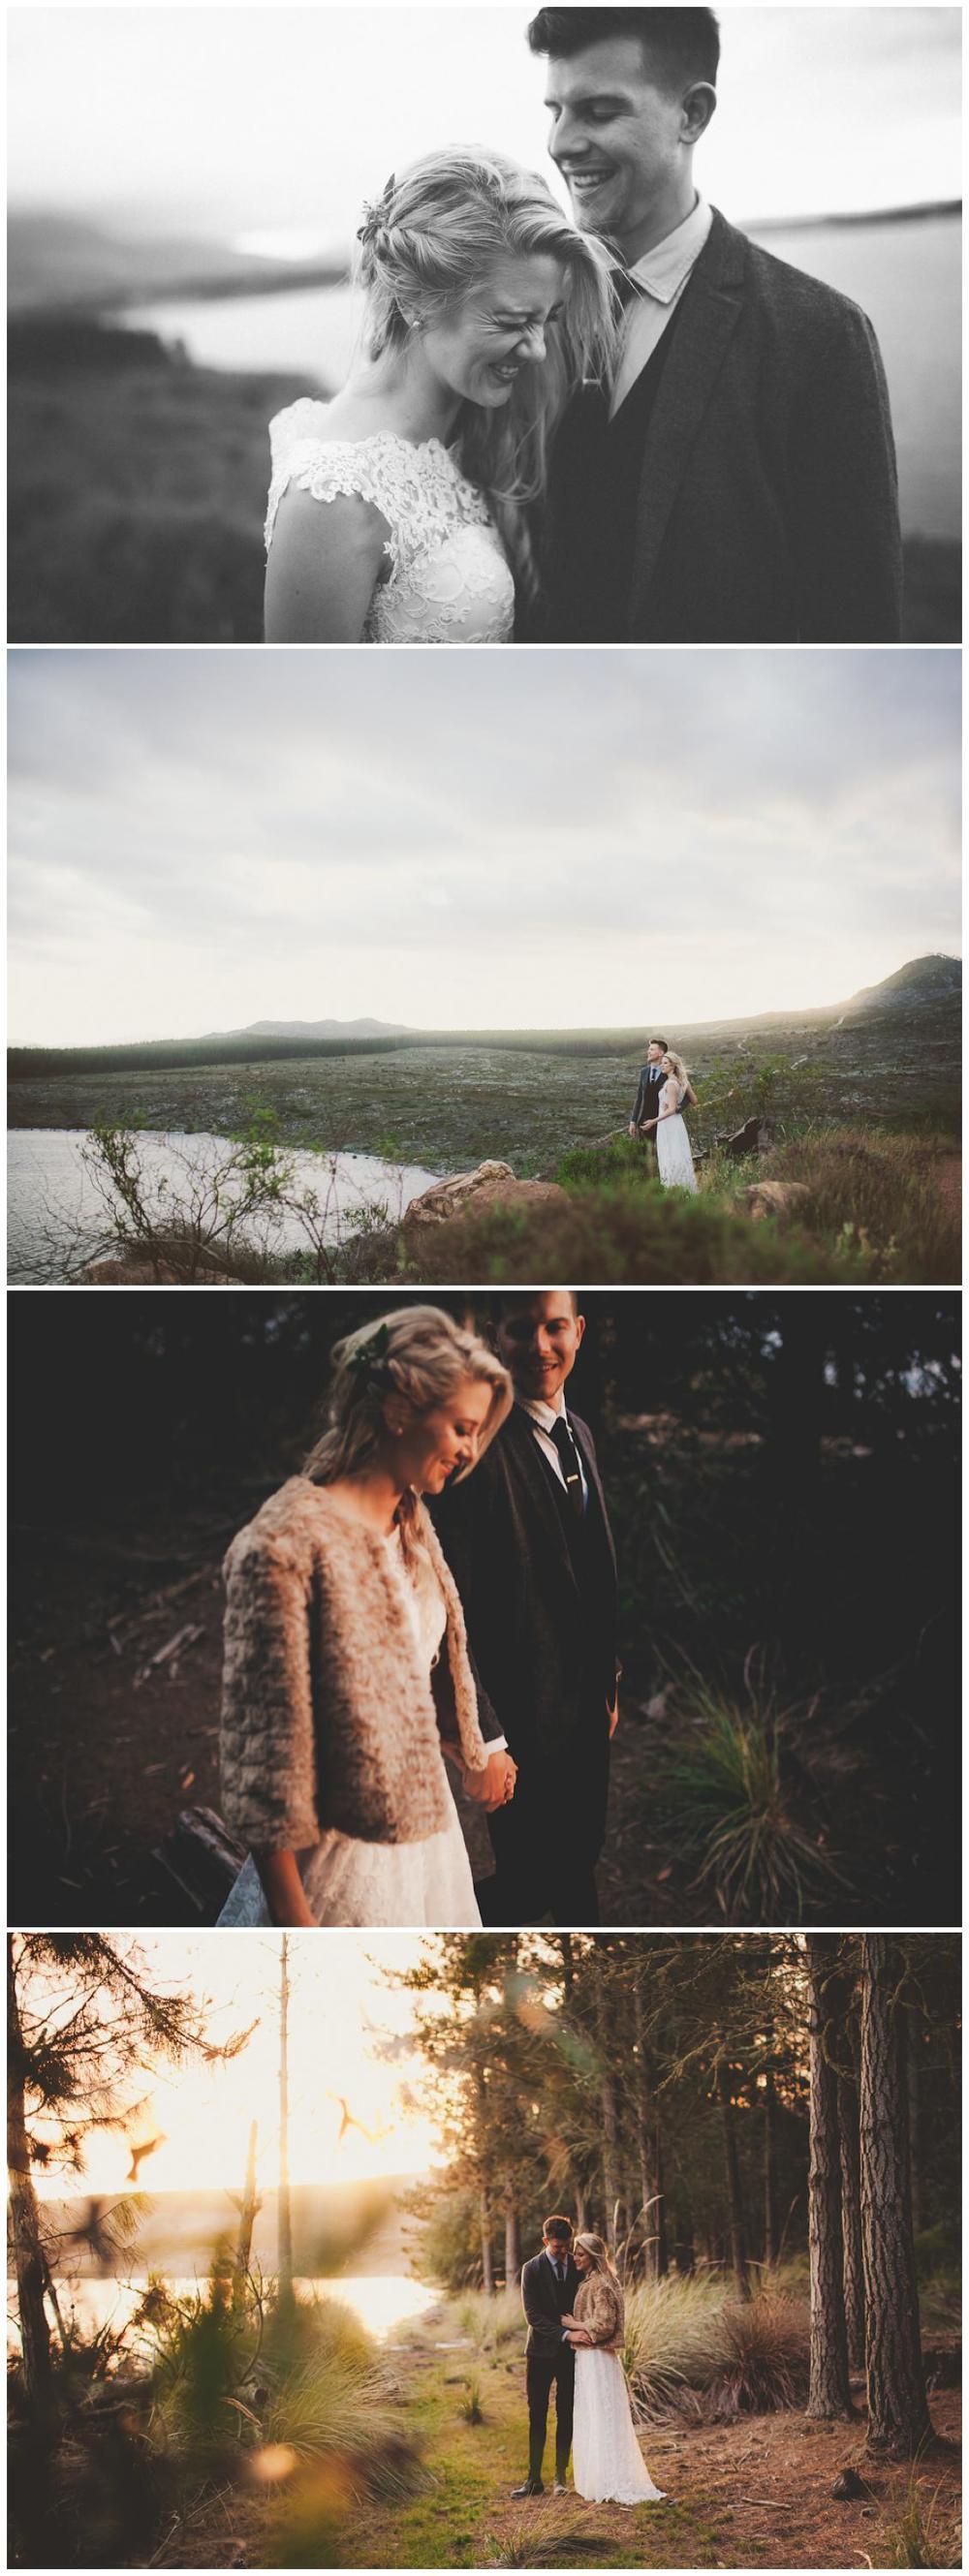 Wessel&Clarissa_FionaClairPhotography-122.jpg